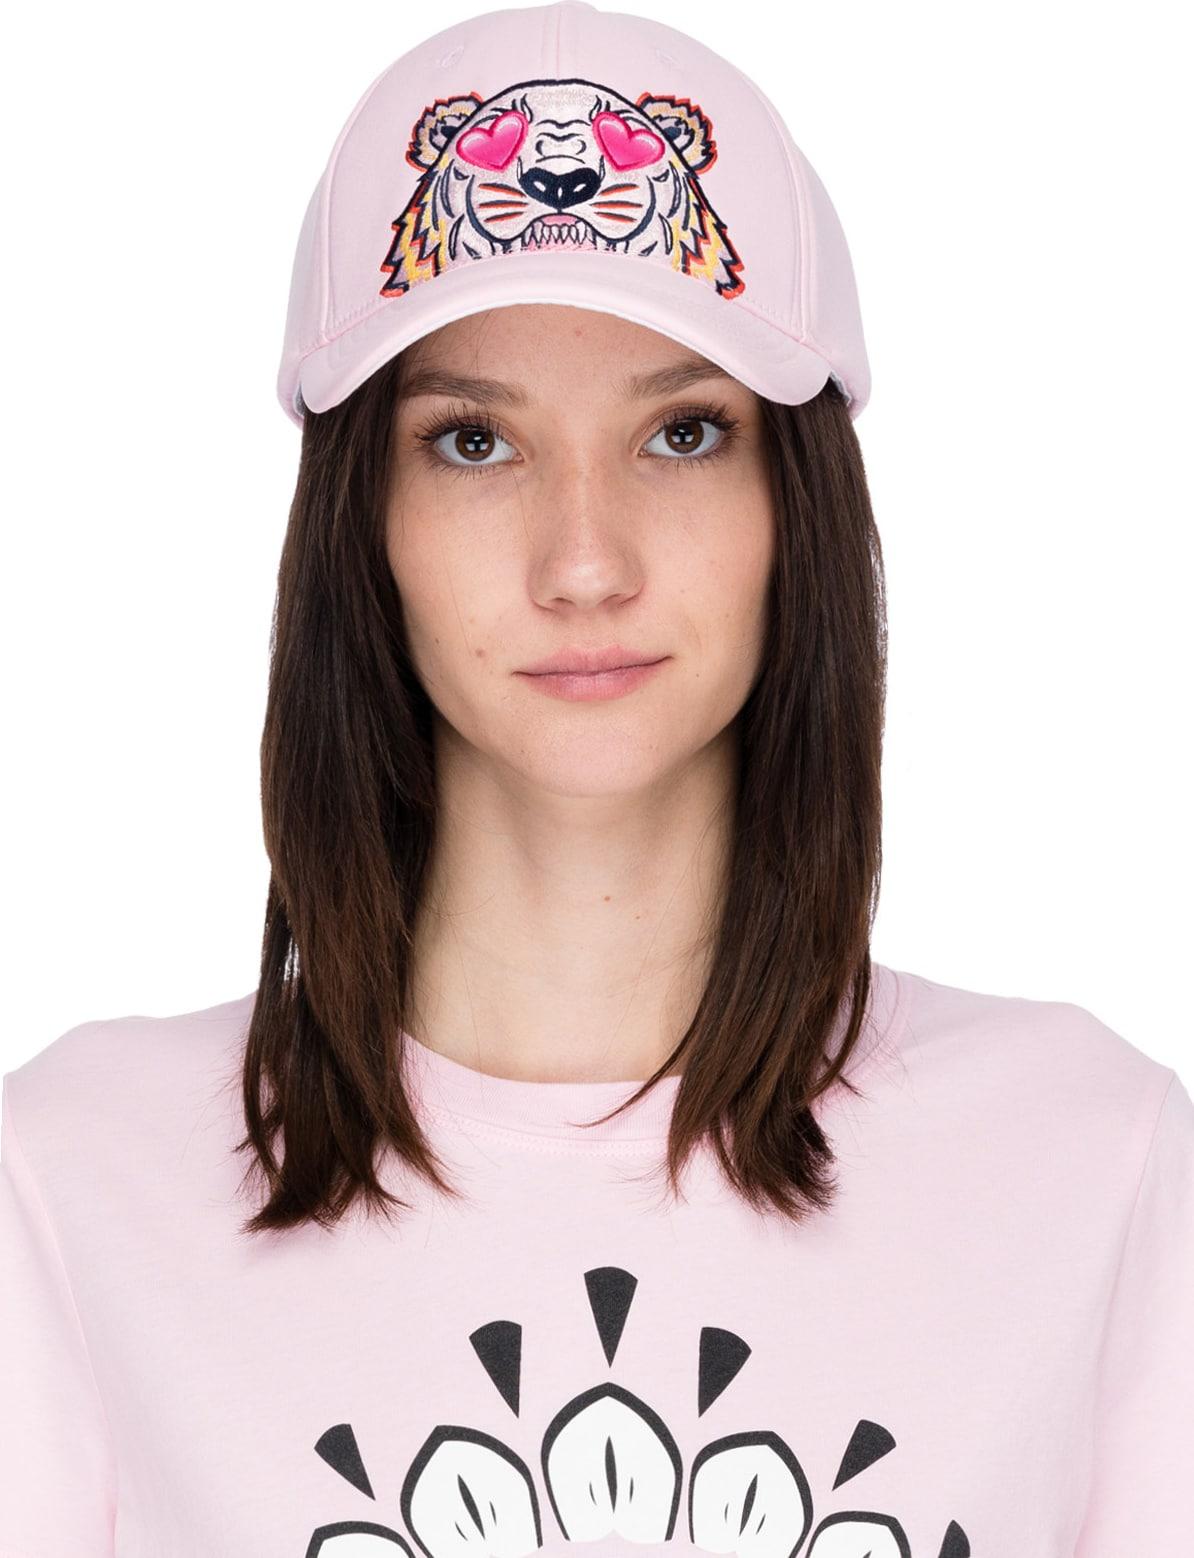 46324b54c0 Kenzo - Tiger Hearts Neoprene Cap - Flamingo Pink